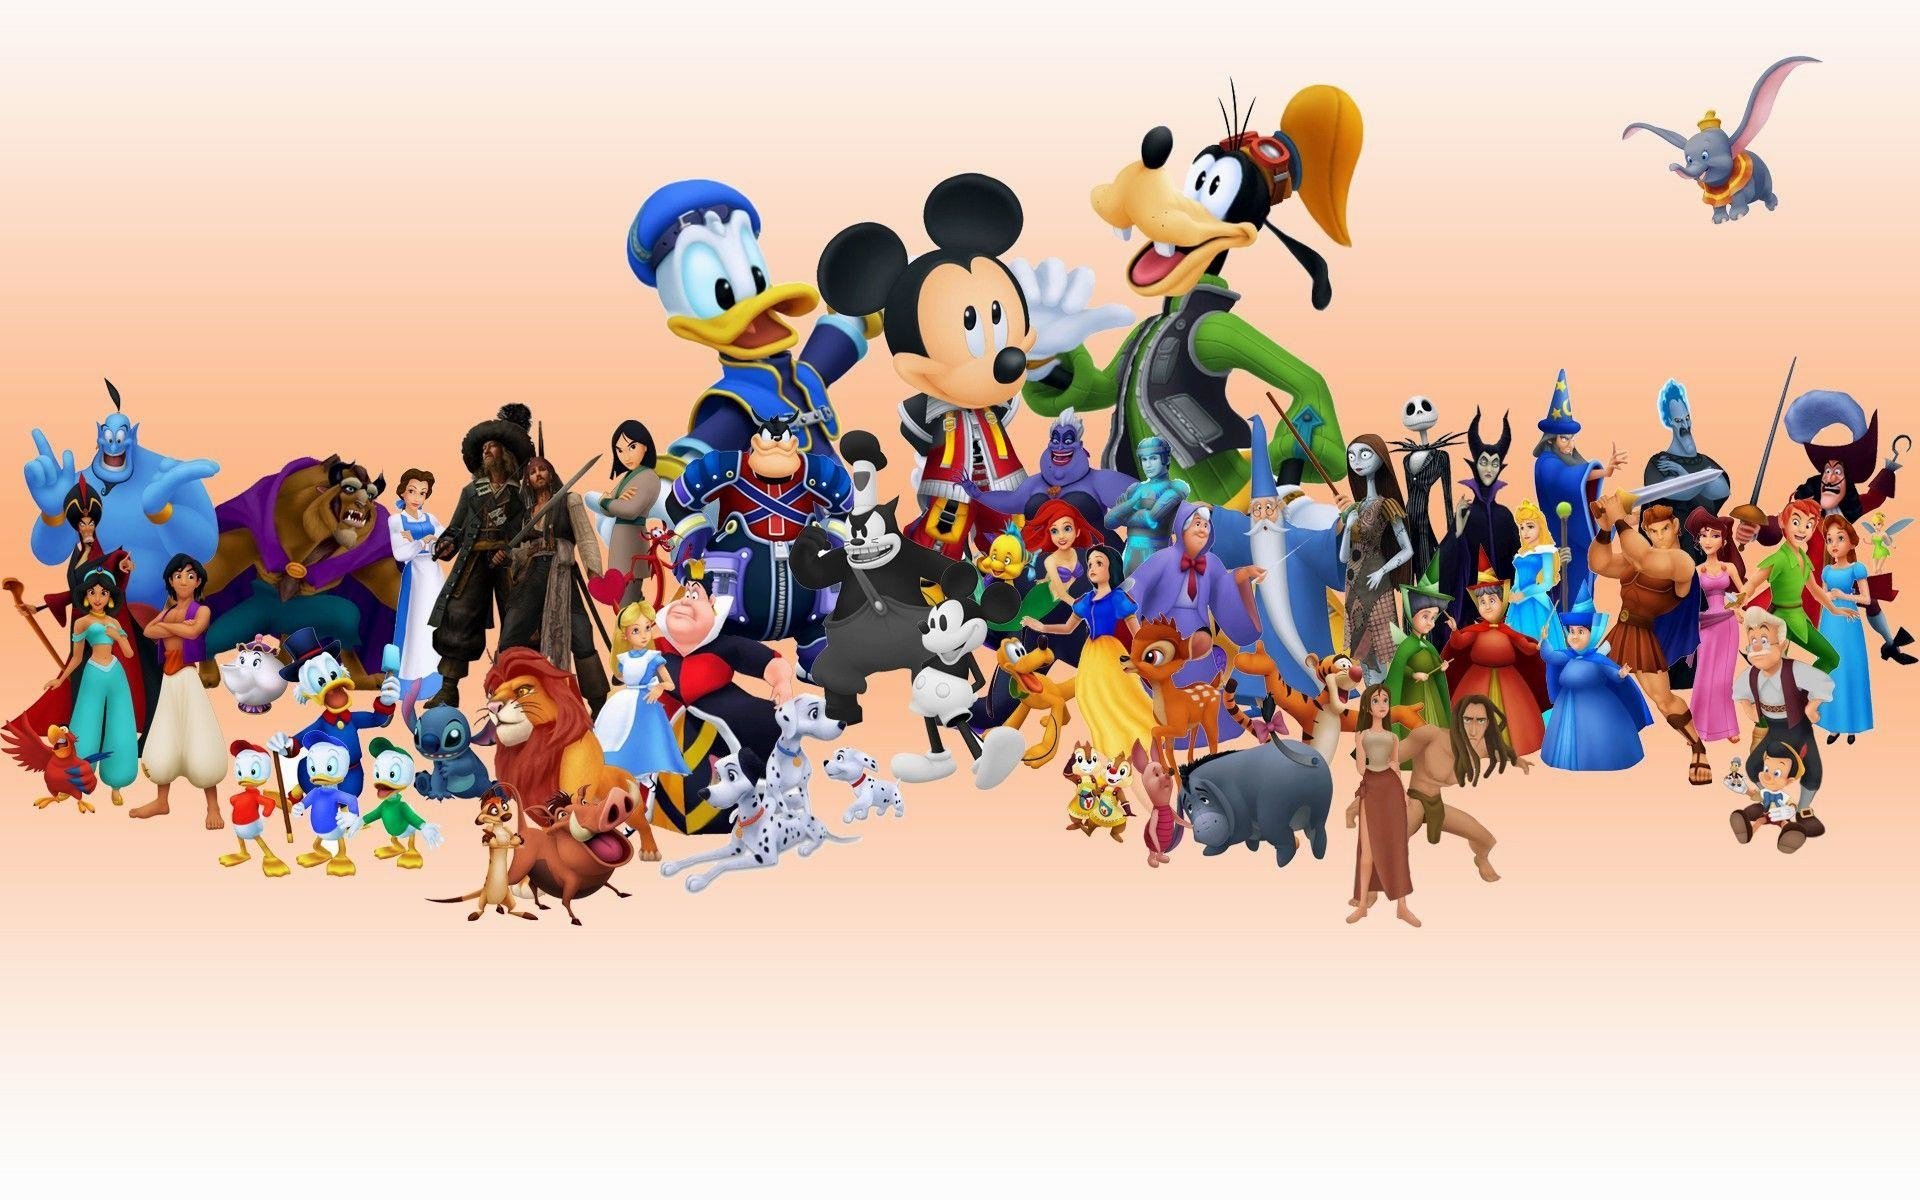 wallpaper.wiki-HD-Disney-World-Wallpapers-PIC-WPE005107